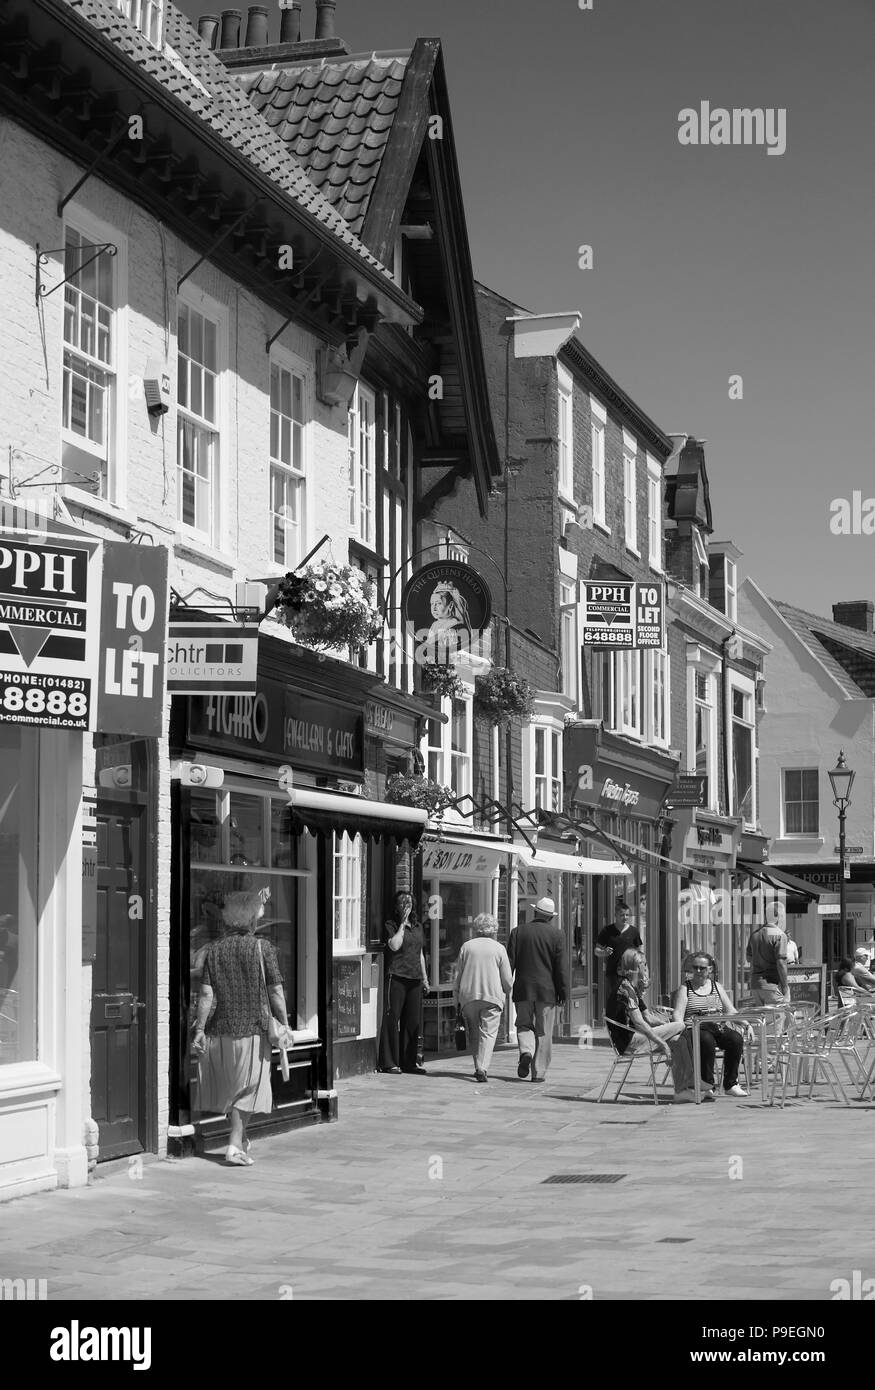 Beverley, East Yorkshire, England UK - Stock Image